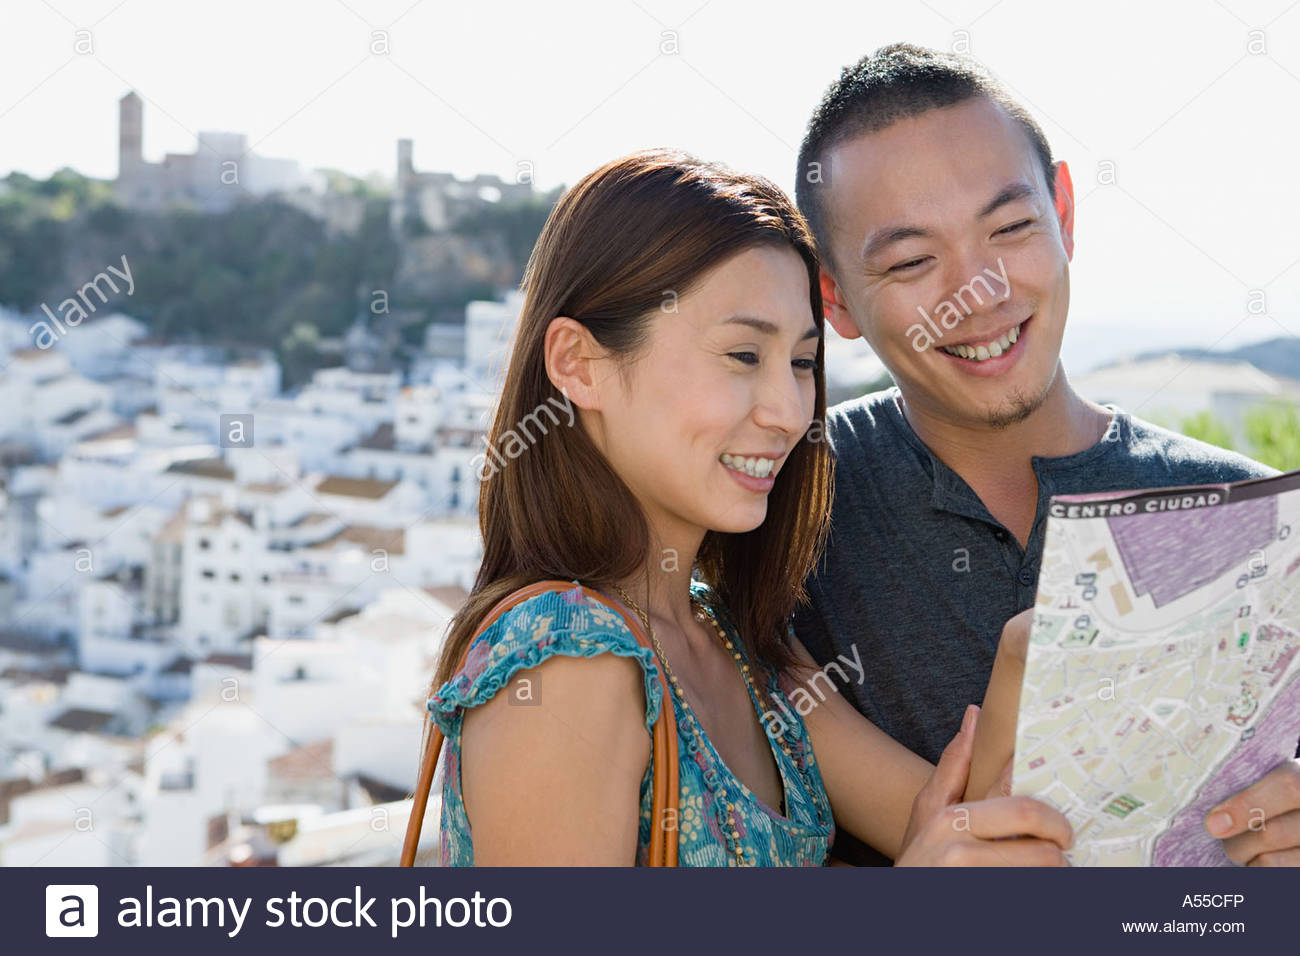 Pareja mirando un mapa Imagen De Stock